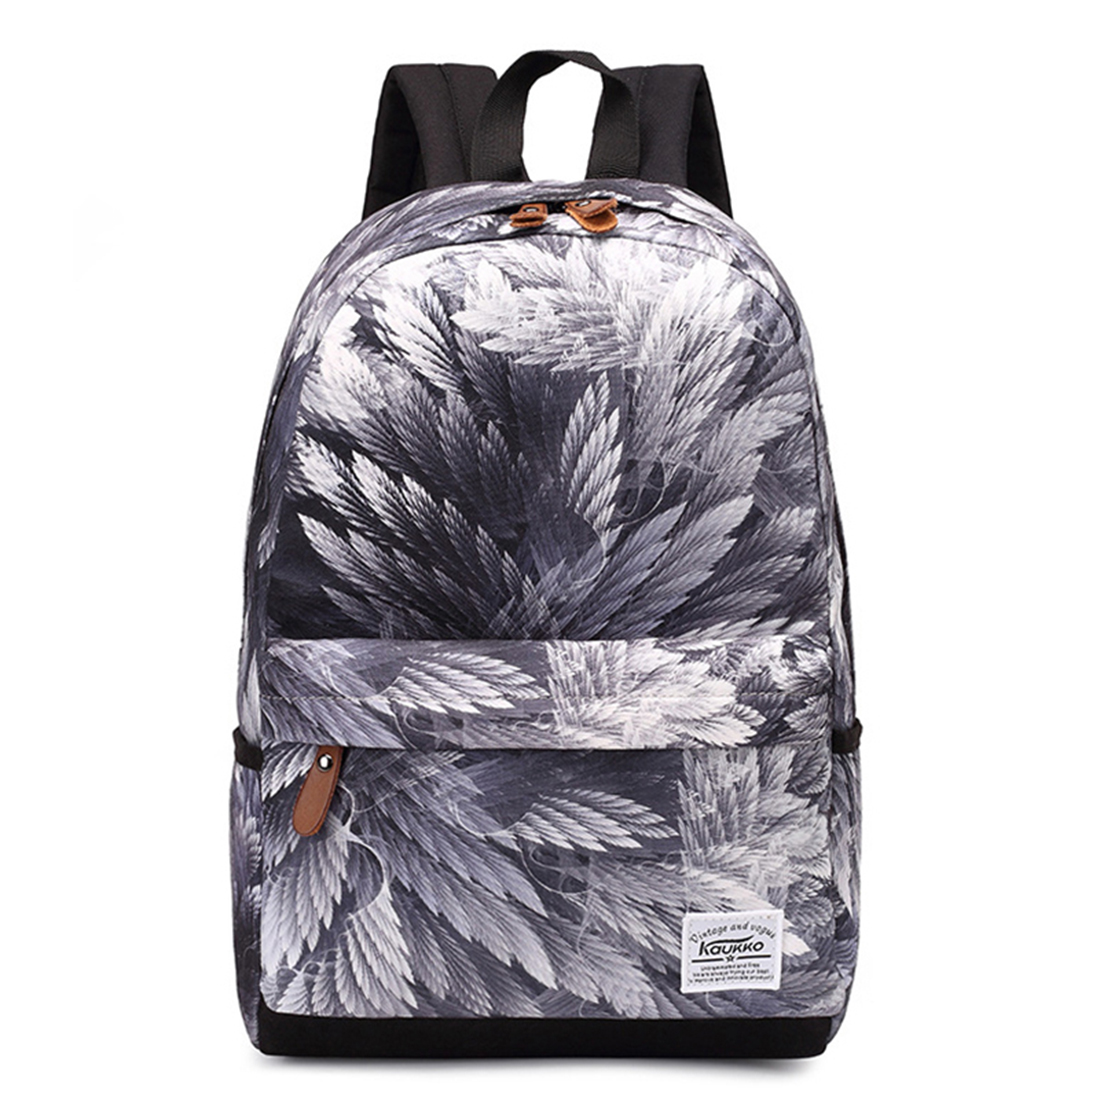 KAUKKO women travelling backpack school bags Fashion printing backpacks for teenagers girls, Feather 1pc hight quality hot fashion unisex emoji backpacks 3d printing bags drawstring backpack nov 10